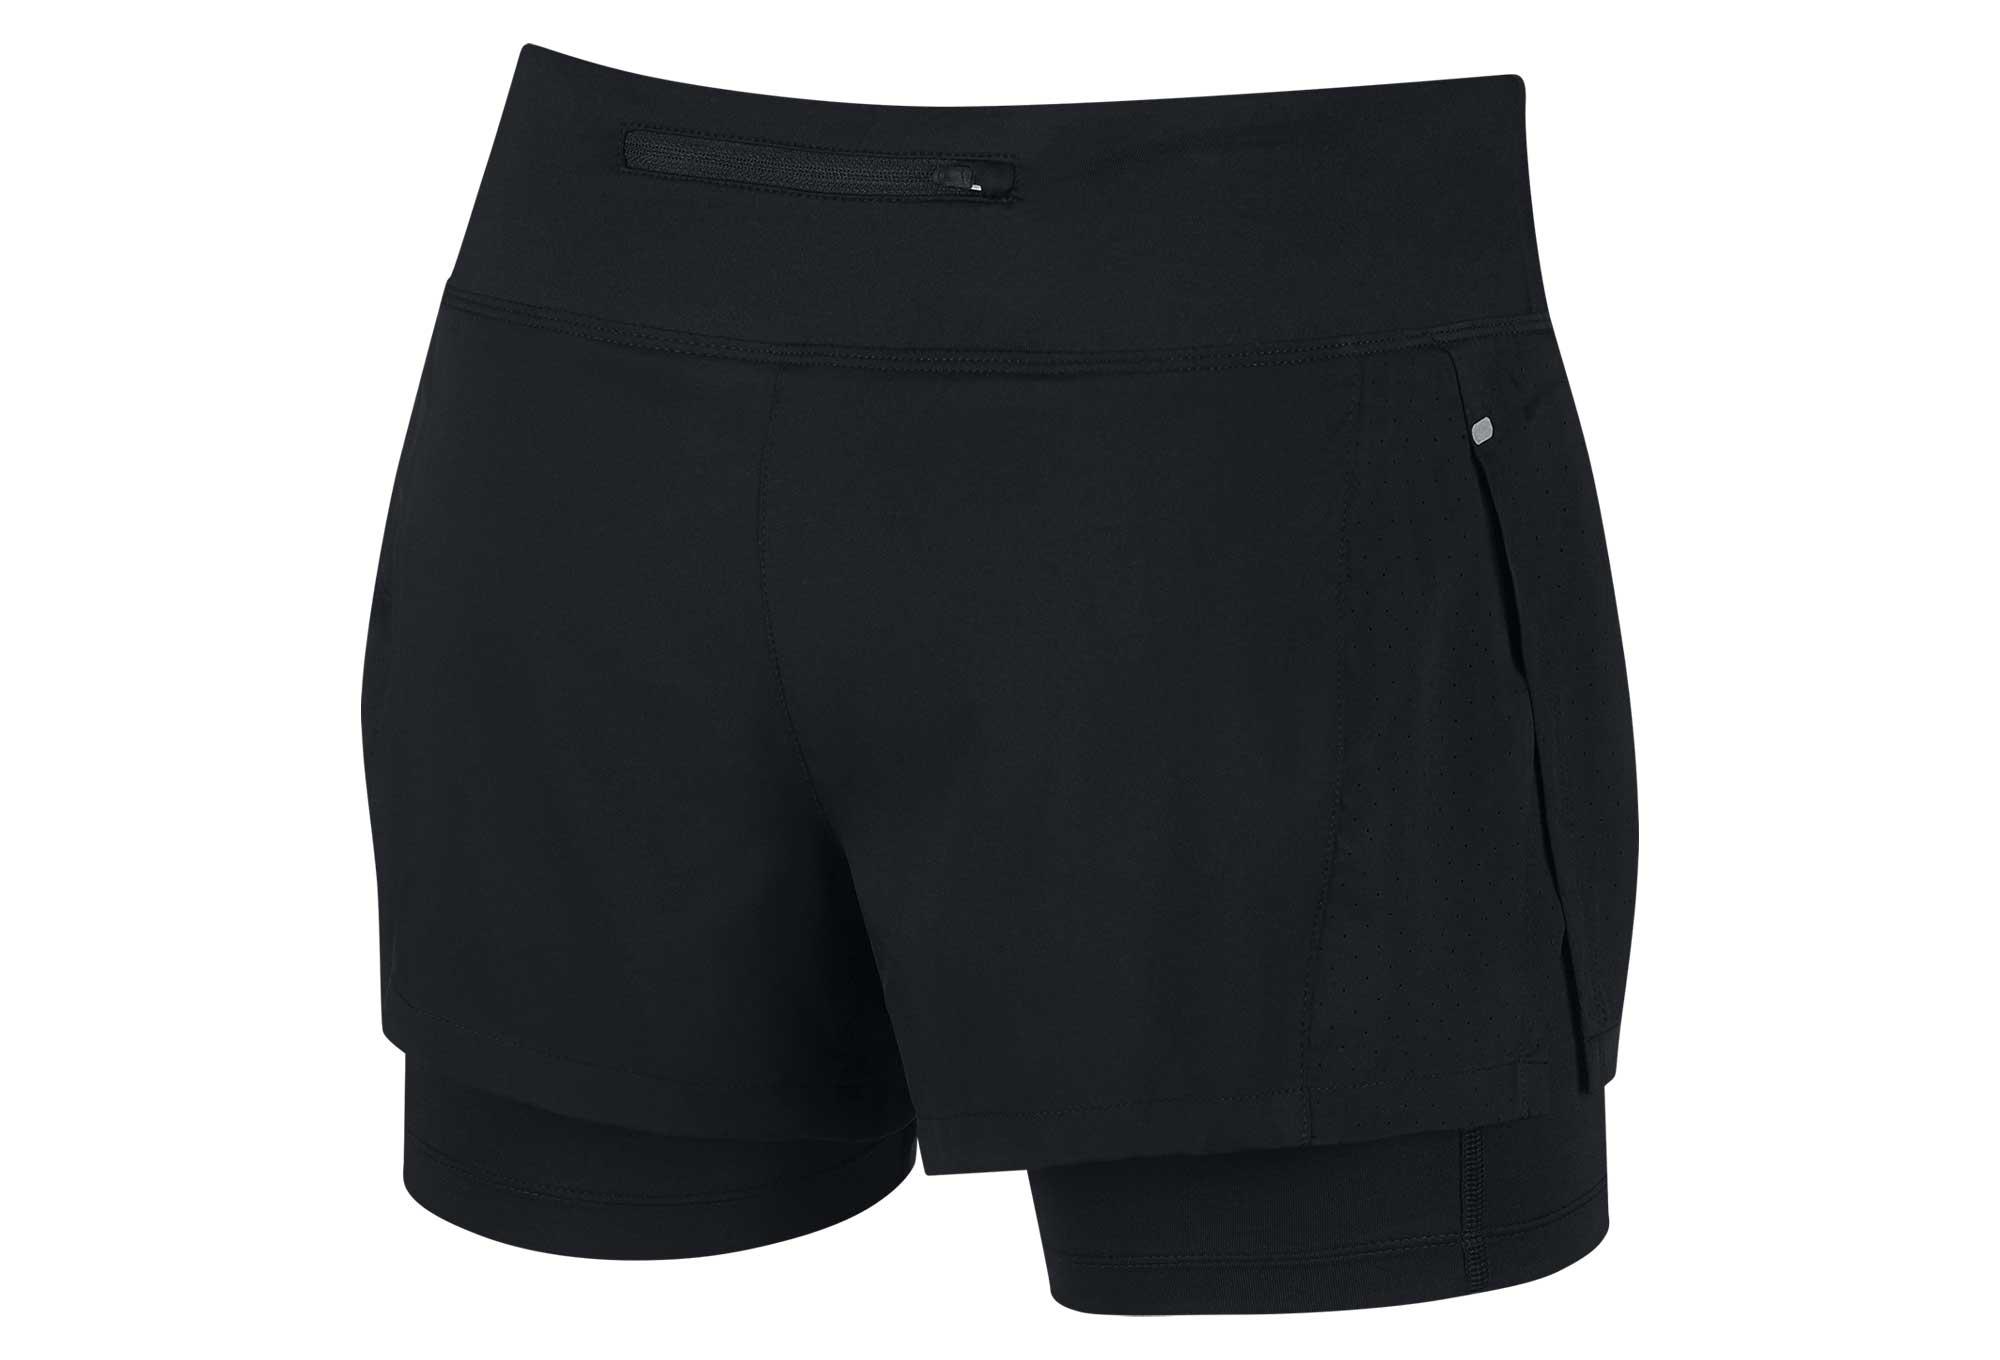 Short 2 en 1 Femme Nike Eclipse Noir